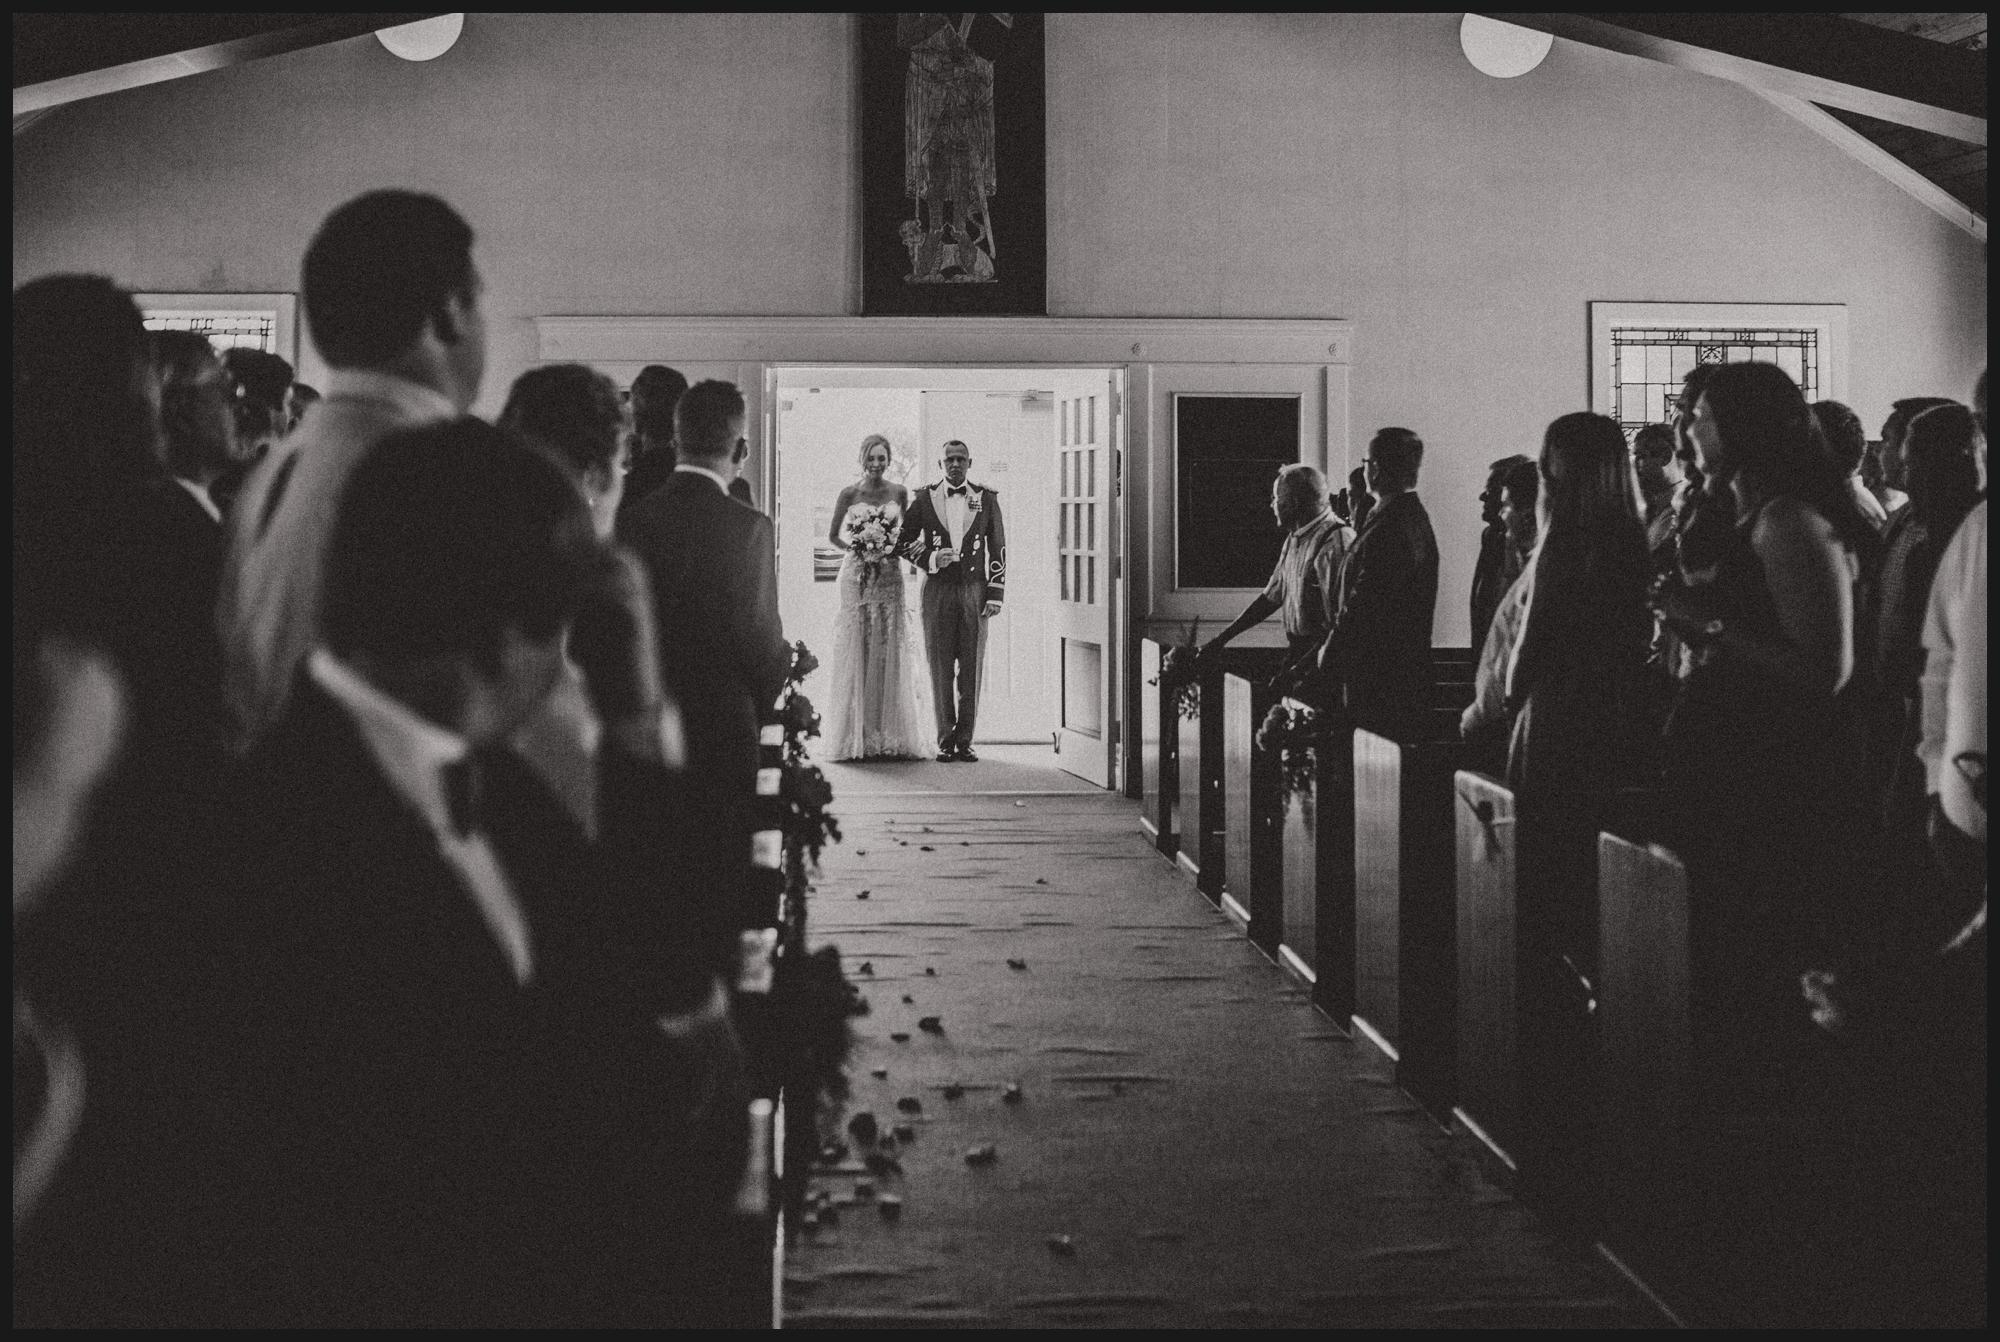 Orlando-Wedding-Photographer-destination-wedding-photographer-florida-wedding-photographer-bohemian-wedding-photographer_0066.jpg